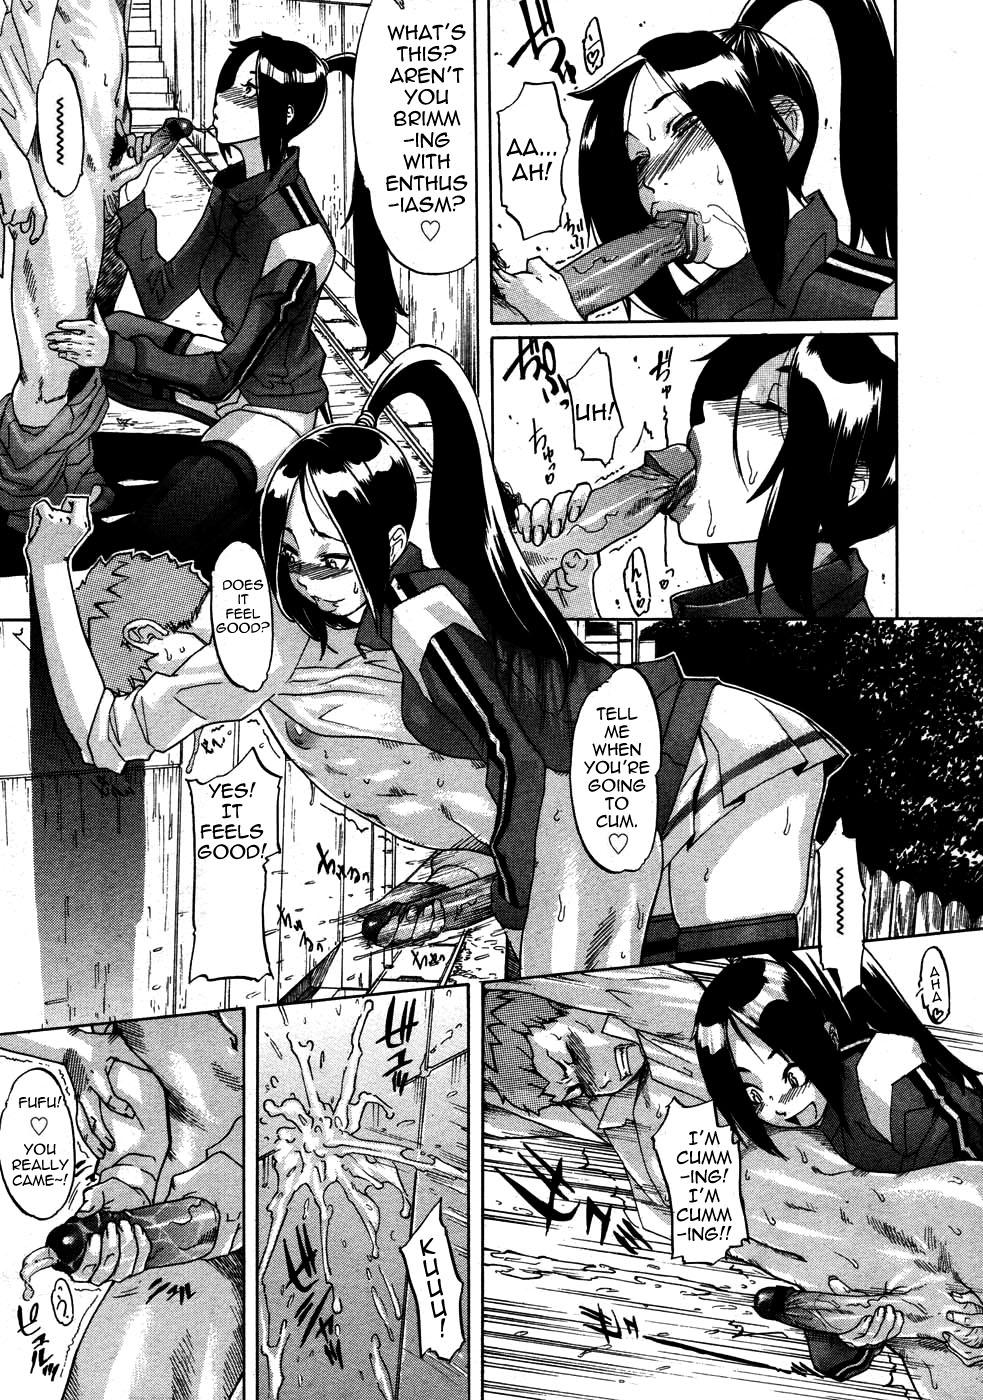 [Royal Koyanagi] Milky Shot! (School Is Crazy these Days) Ch.1-2 [English] 4